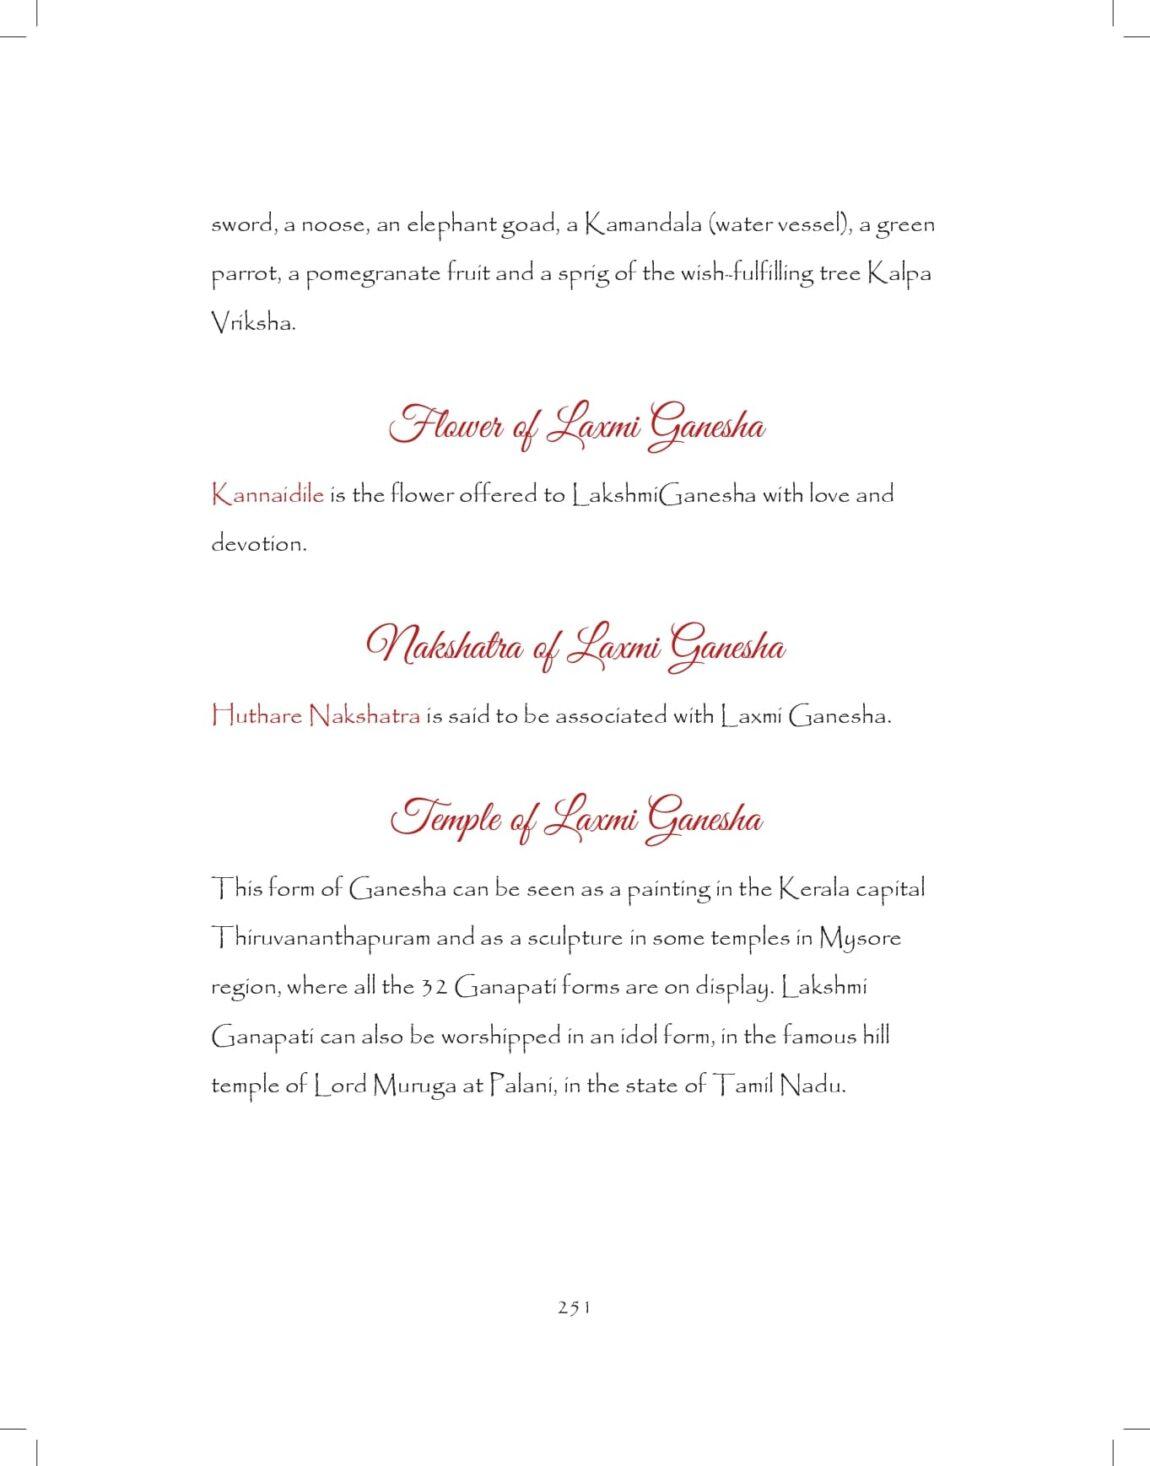 Ganesh-print_pages-to-jpg-0251.jpg